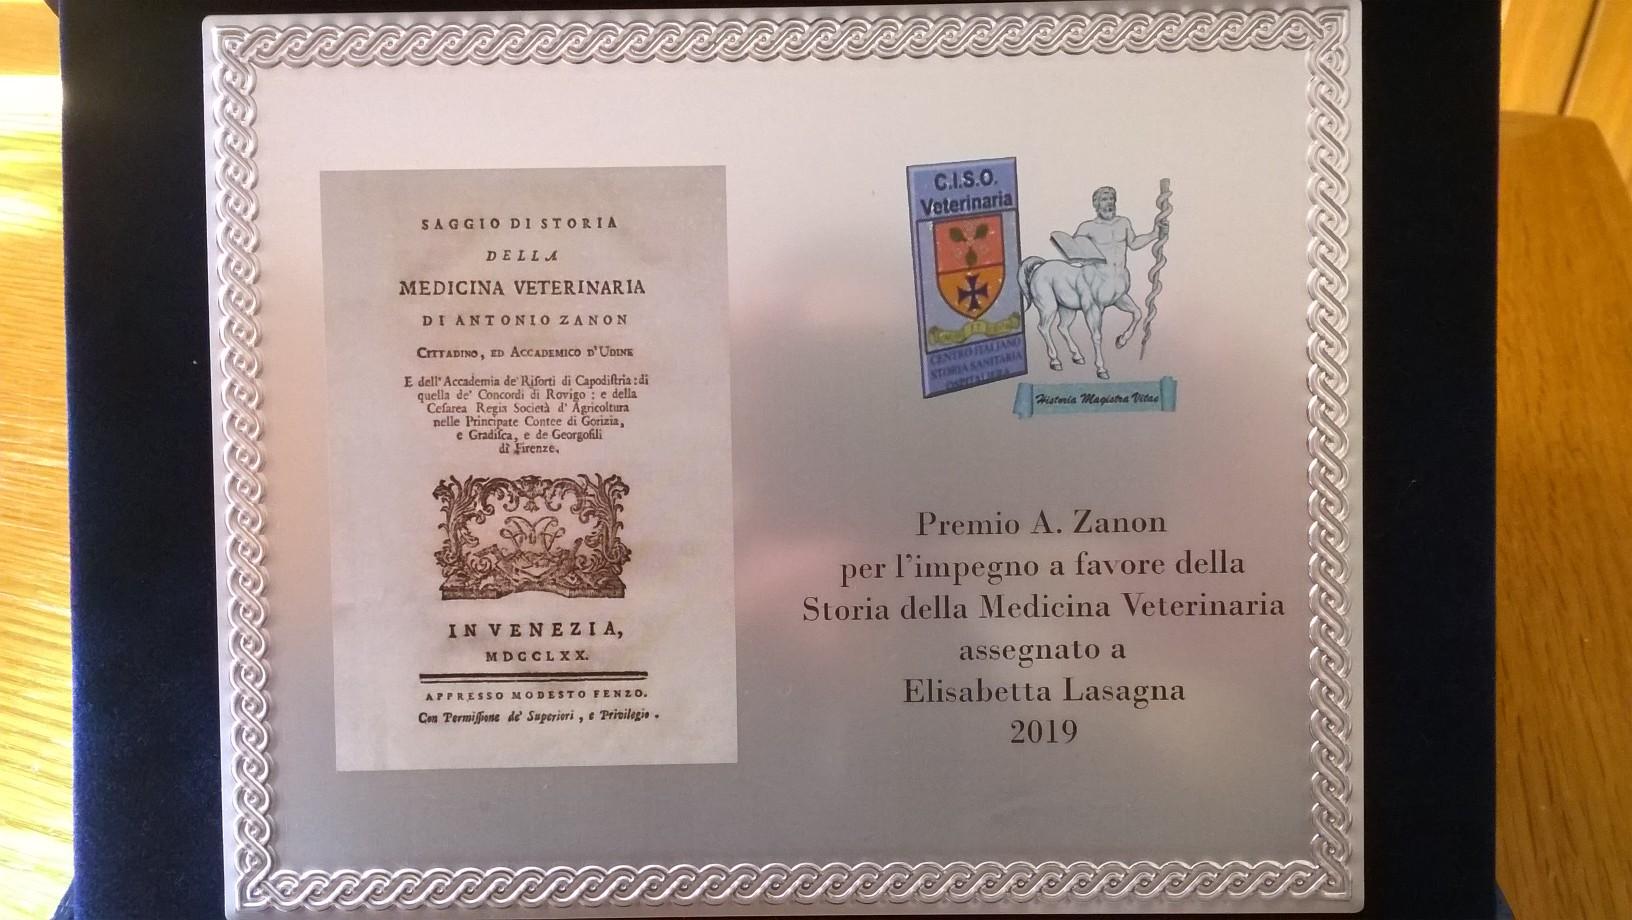 EL premio Zanon